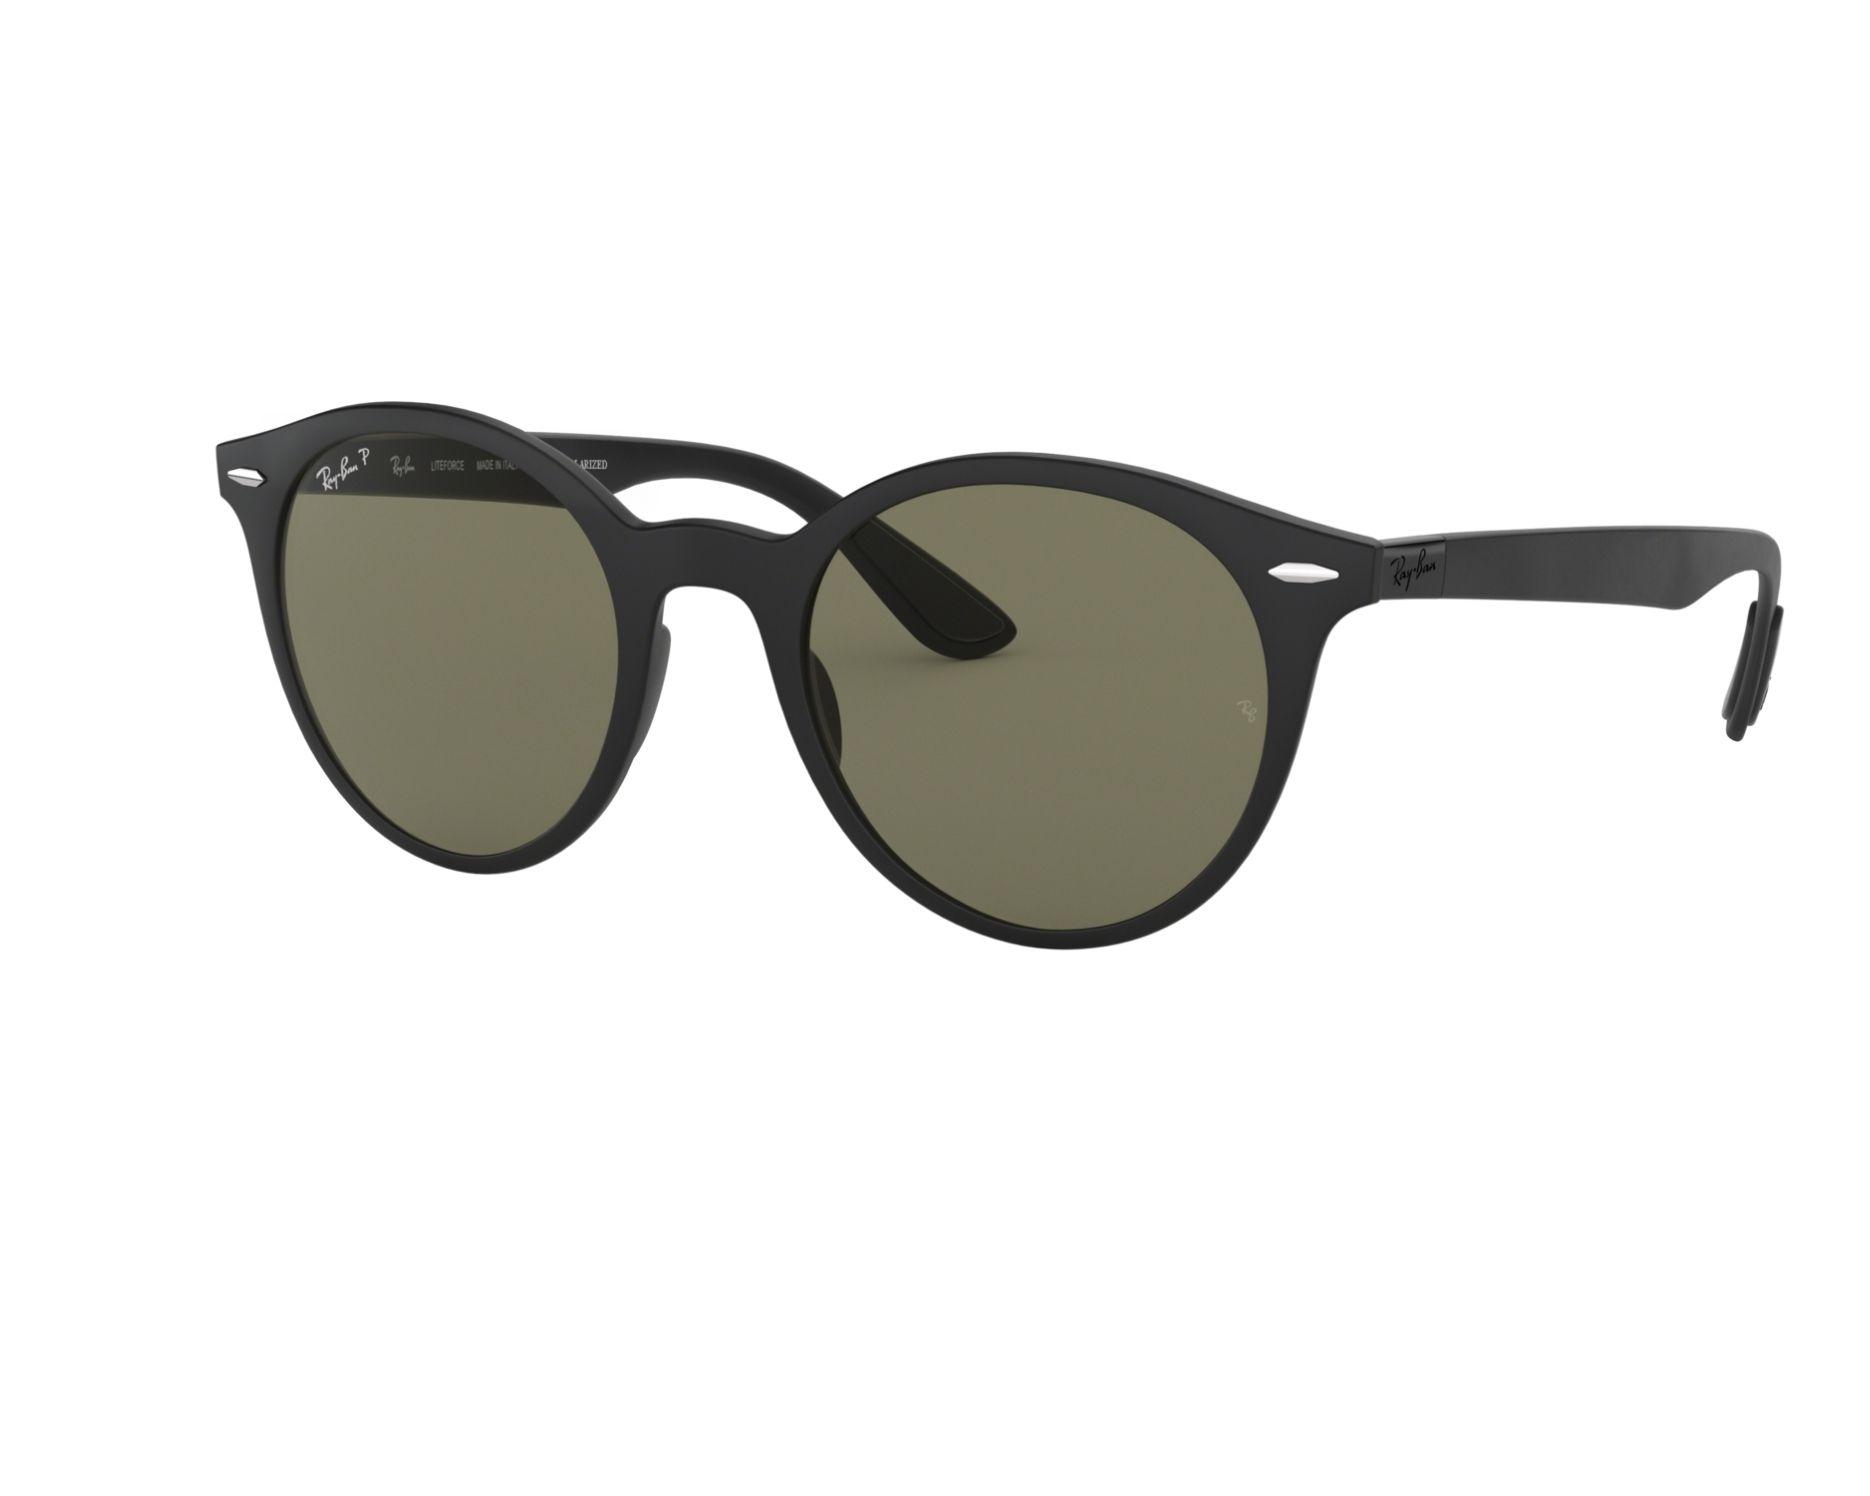 1bcc3a462e Sunglasses Ray-Ban RB-4296 601S9A 51-21 Black